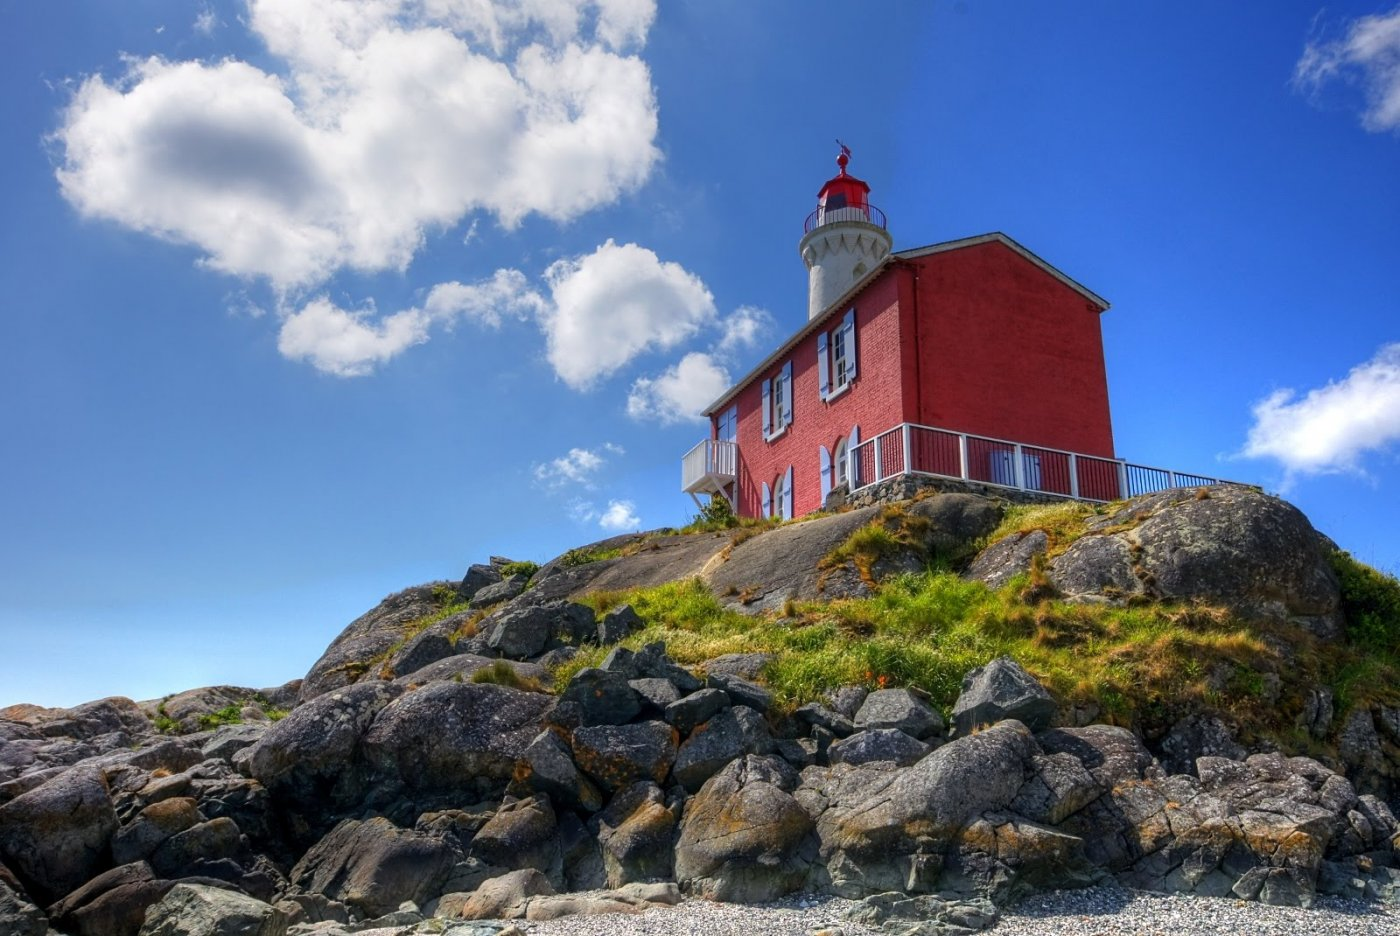 Фото Маяк Фисгард. Канада, British Columbia, Victoria, Unnamed Road